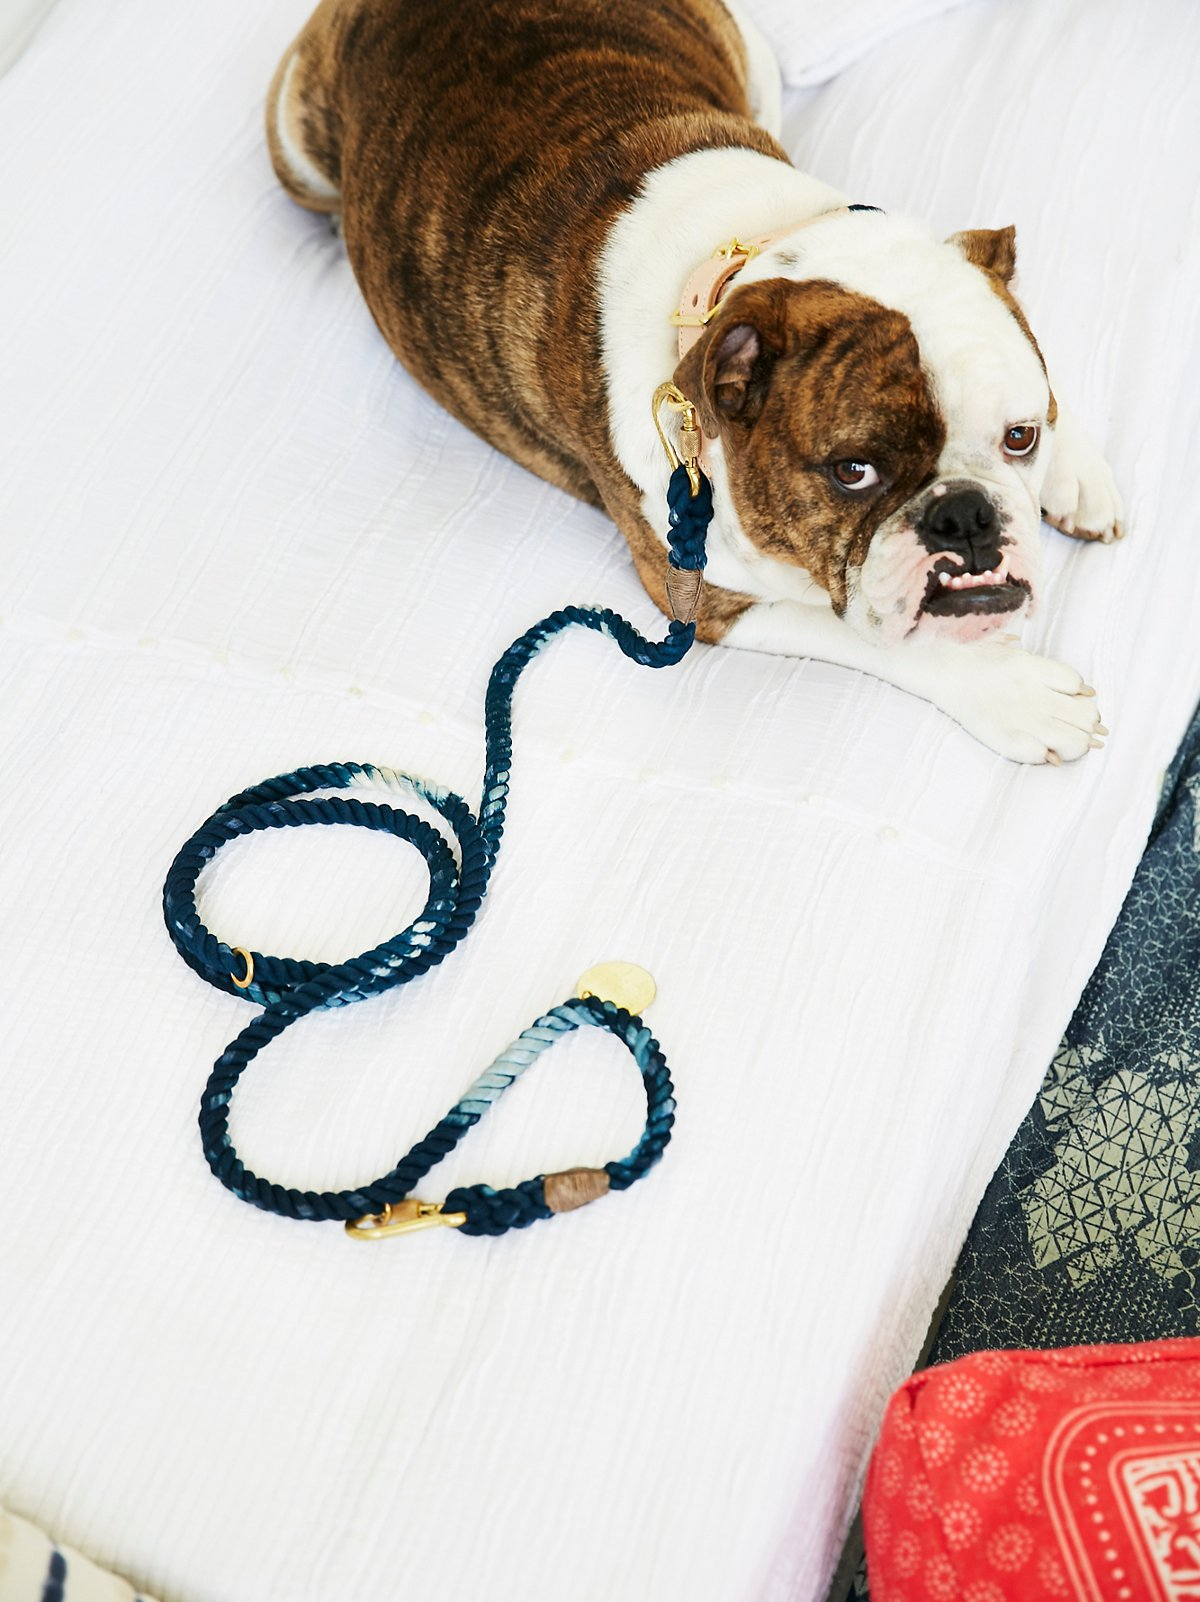 Marble Dog Leash